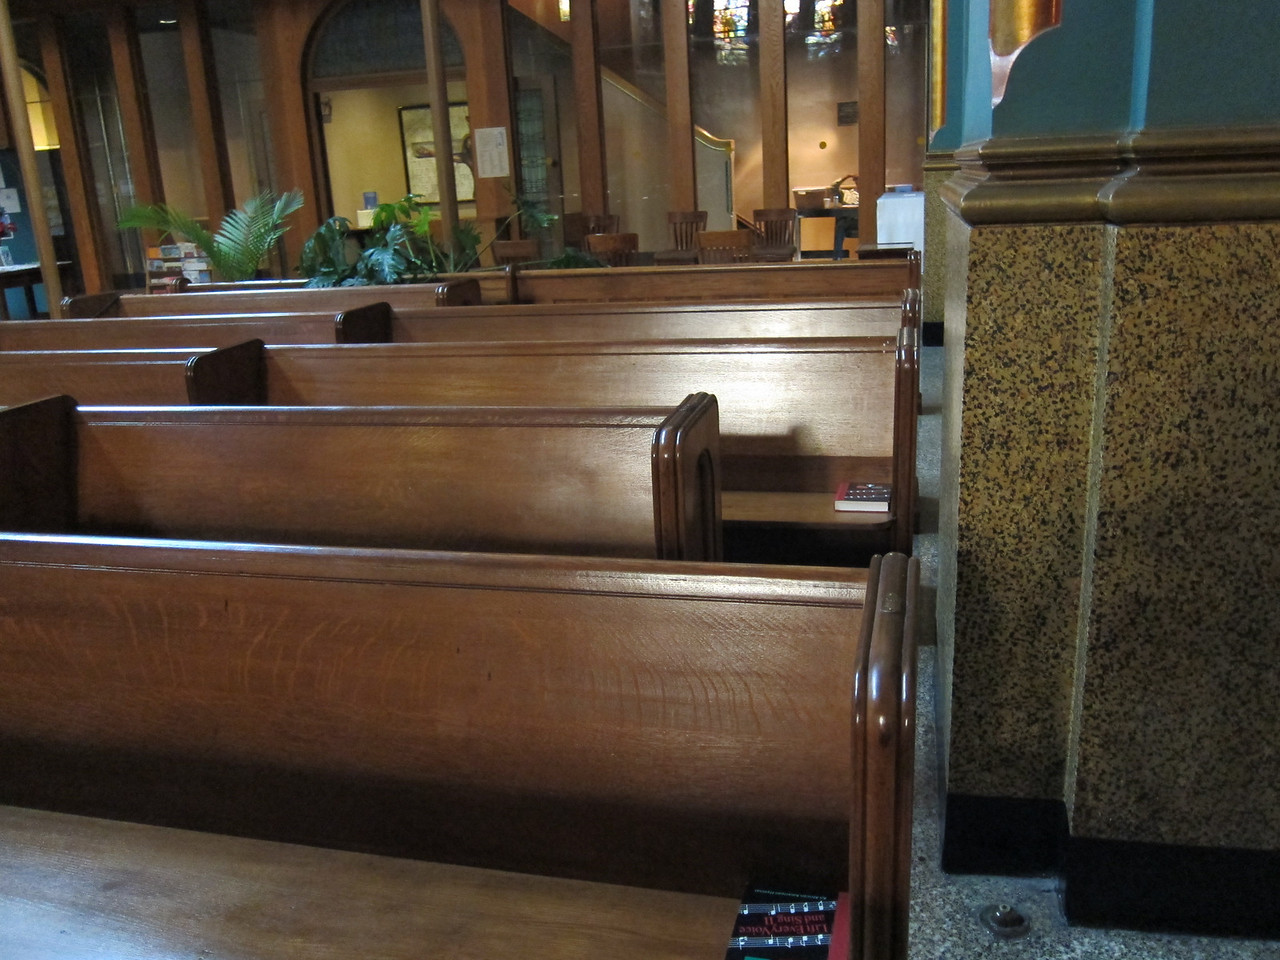 St Michael's Church_2013-11-26_4490_short pew near column